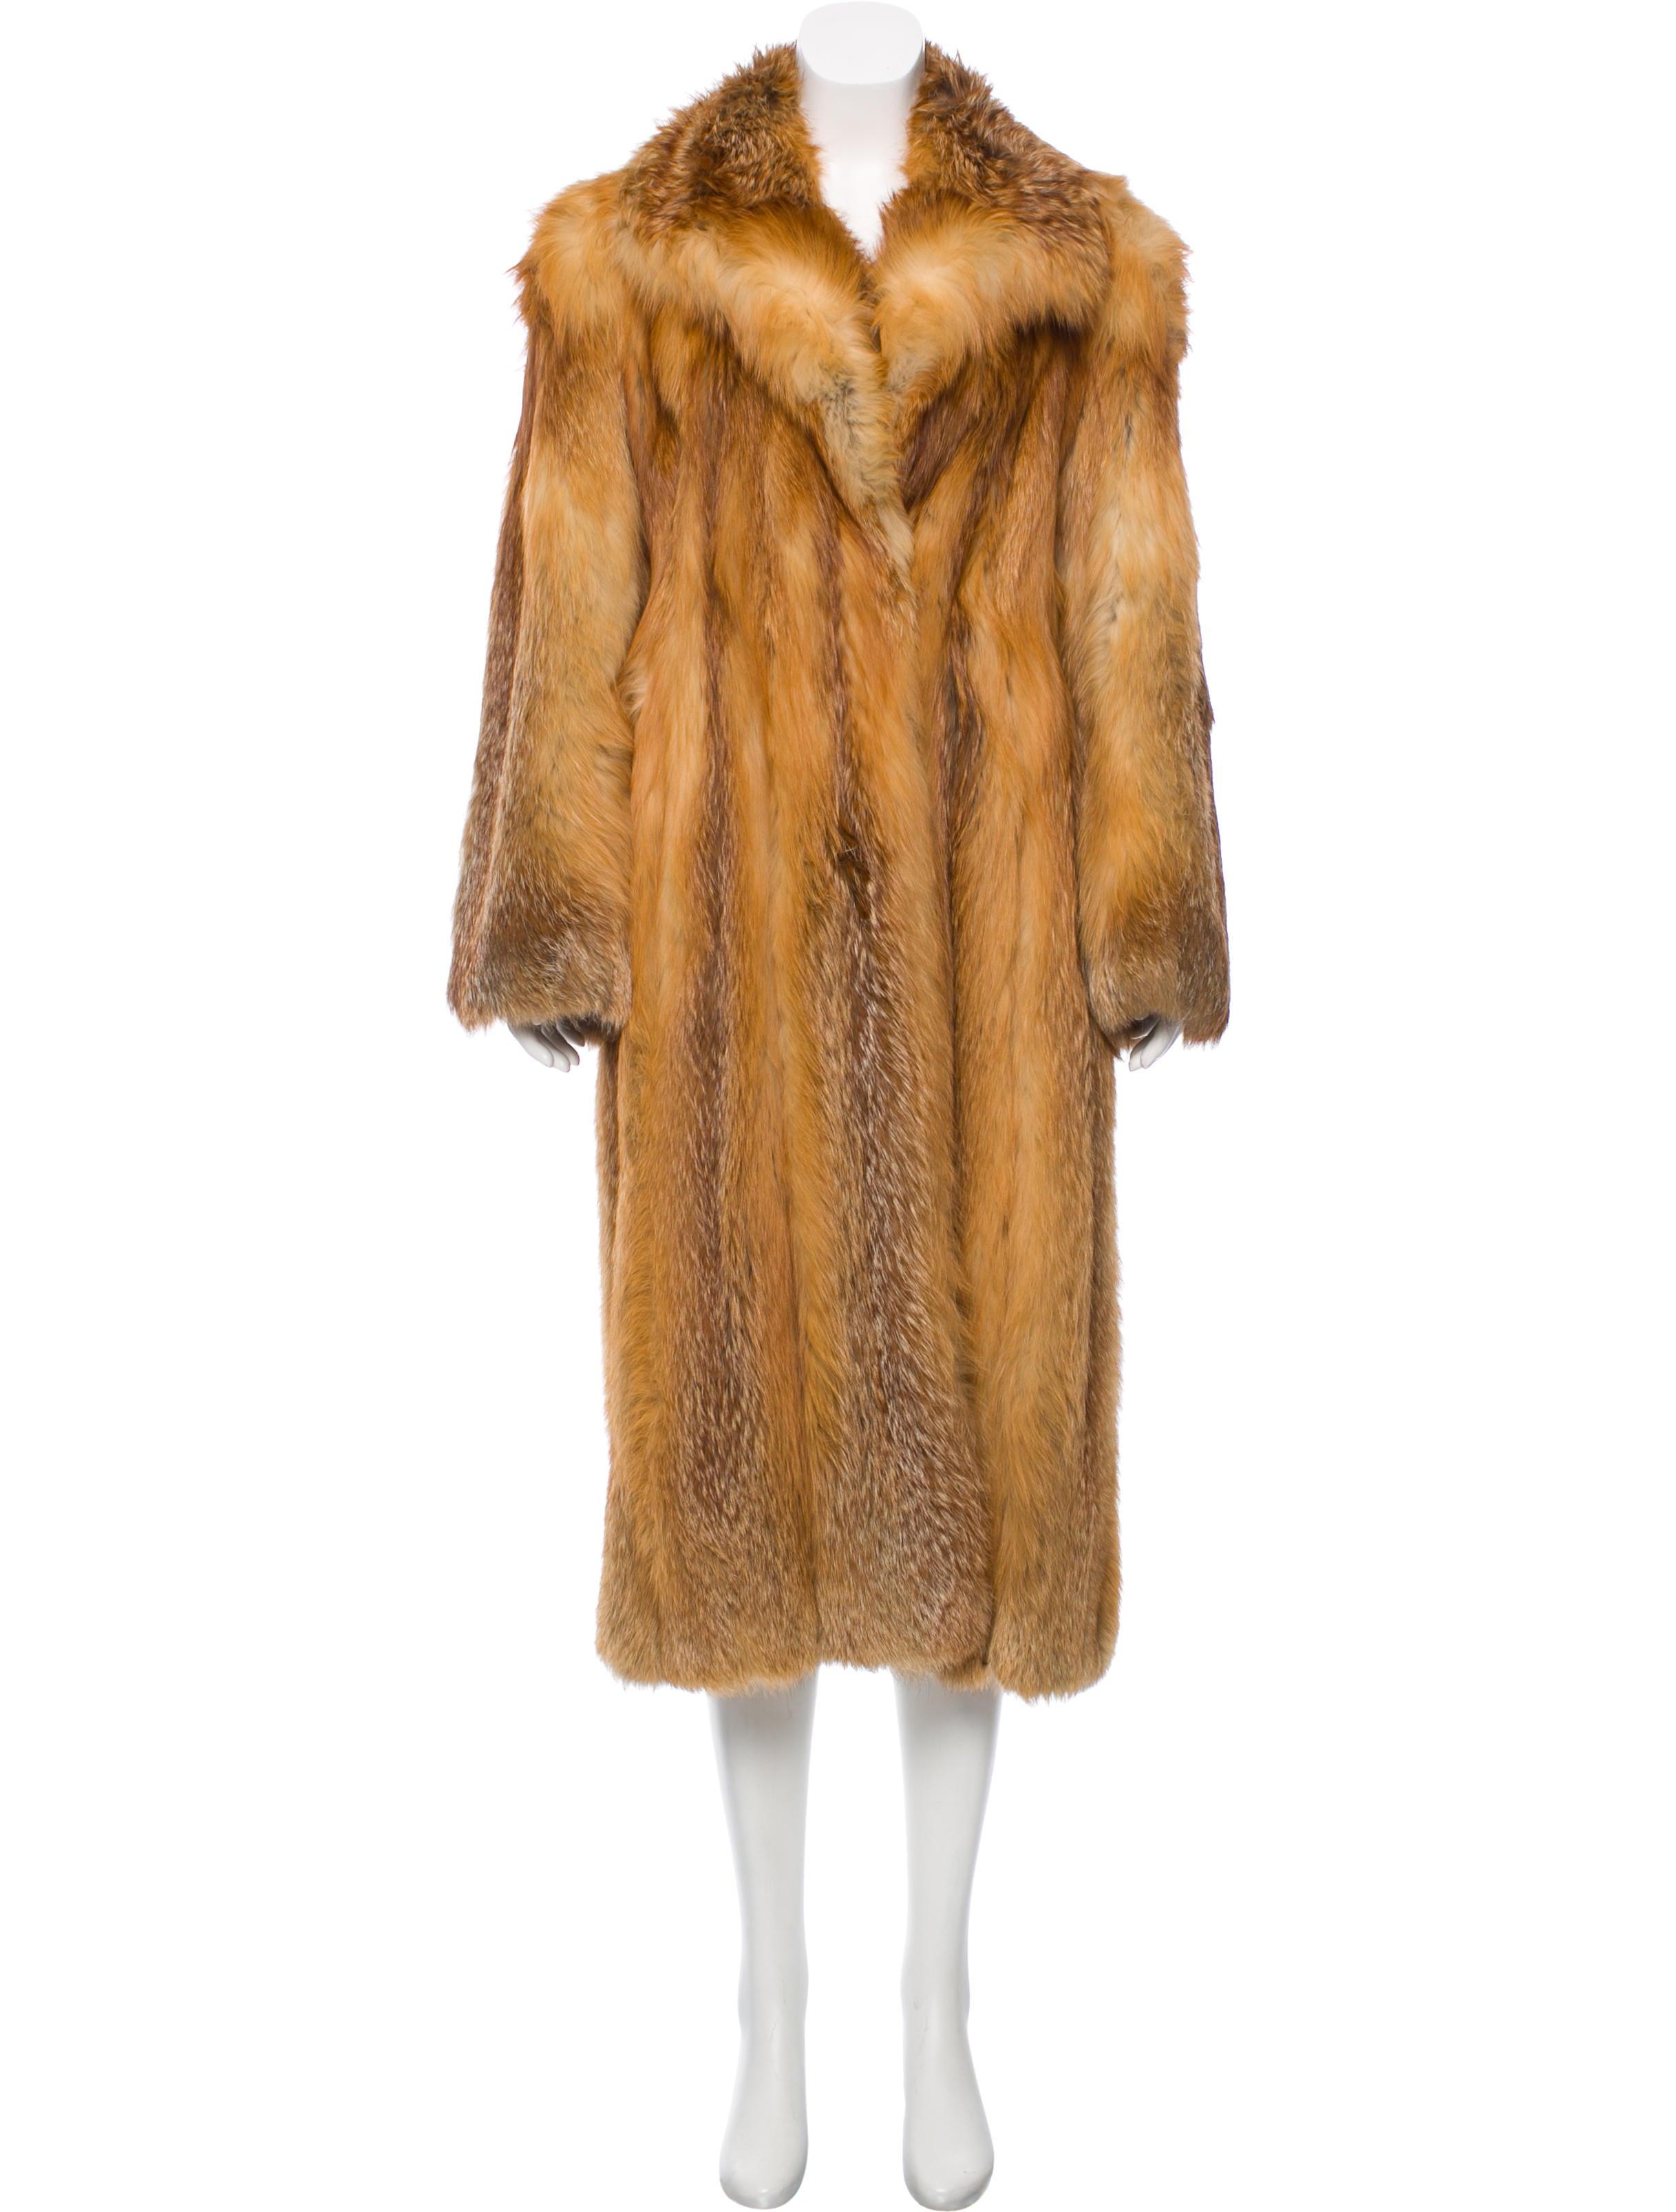 neiman marcus red fox fur coat clothing nemrc20385. Black Bedroom Furniture Sets. Home Design Ideas